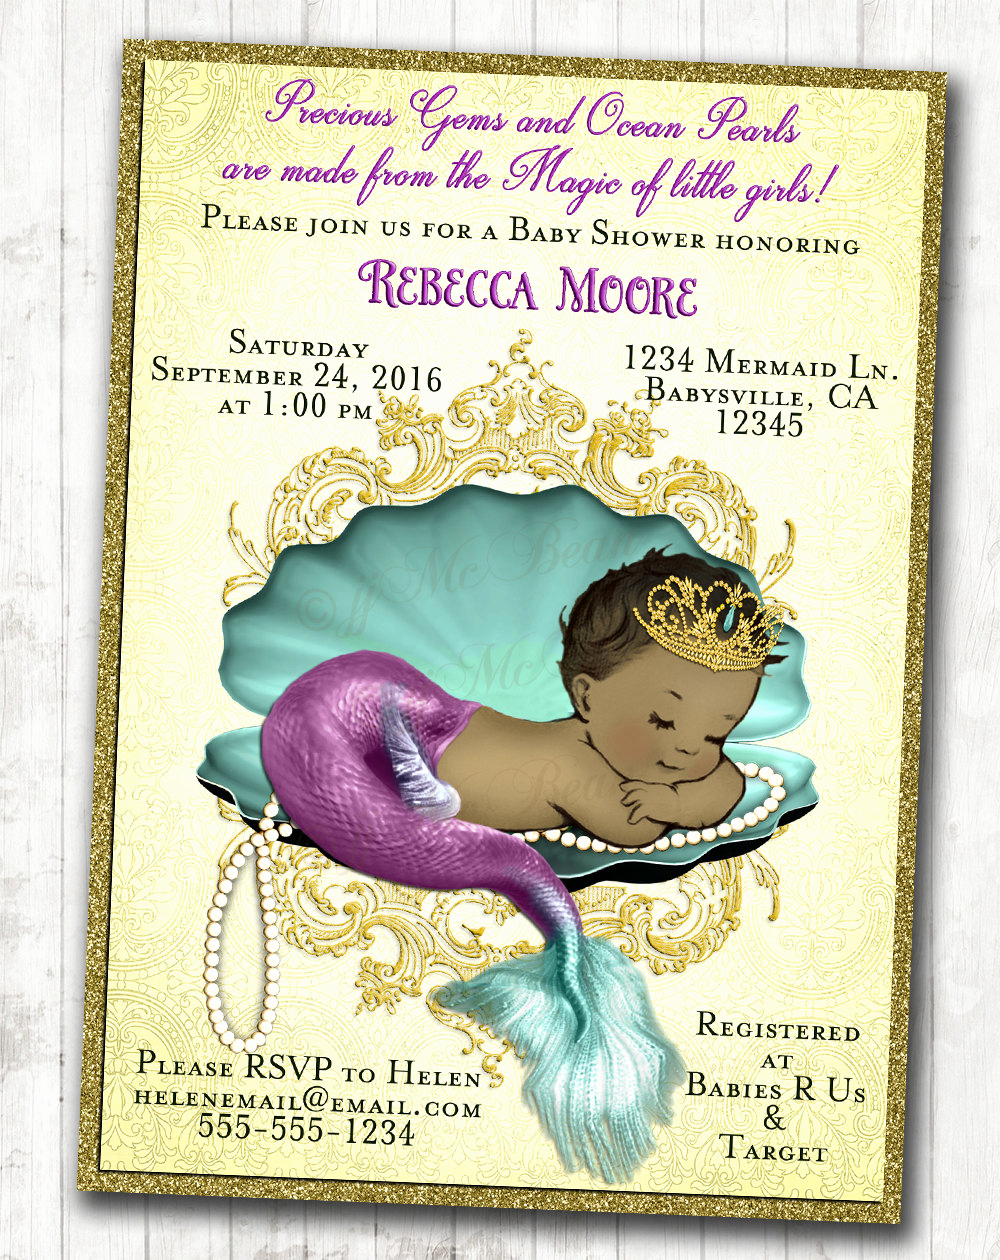 Mermaid Baby Shower Invitation Wording Beautiful Mermaid Baby Shower Invitation Little Mermaid Baby Shower